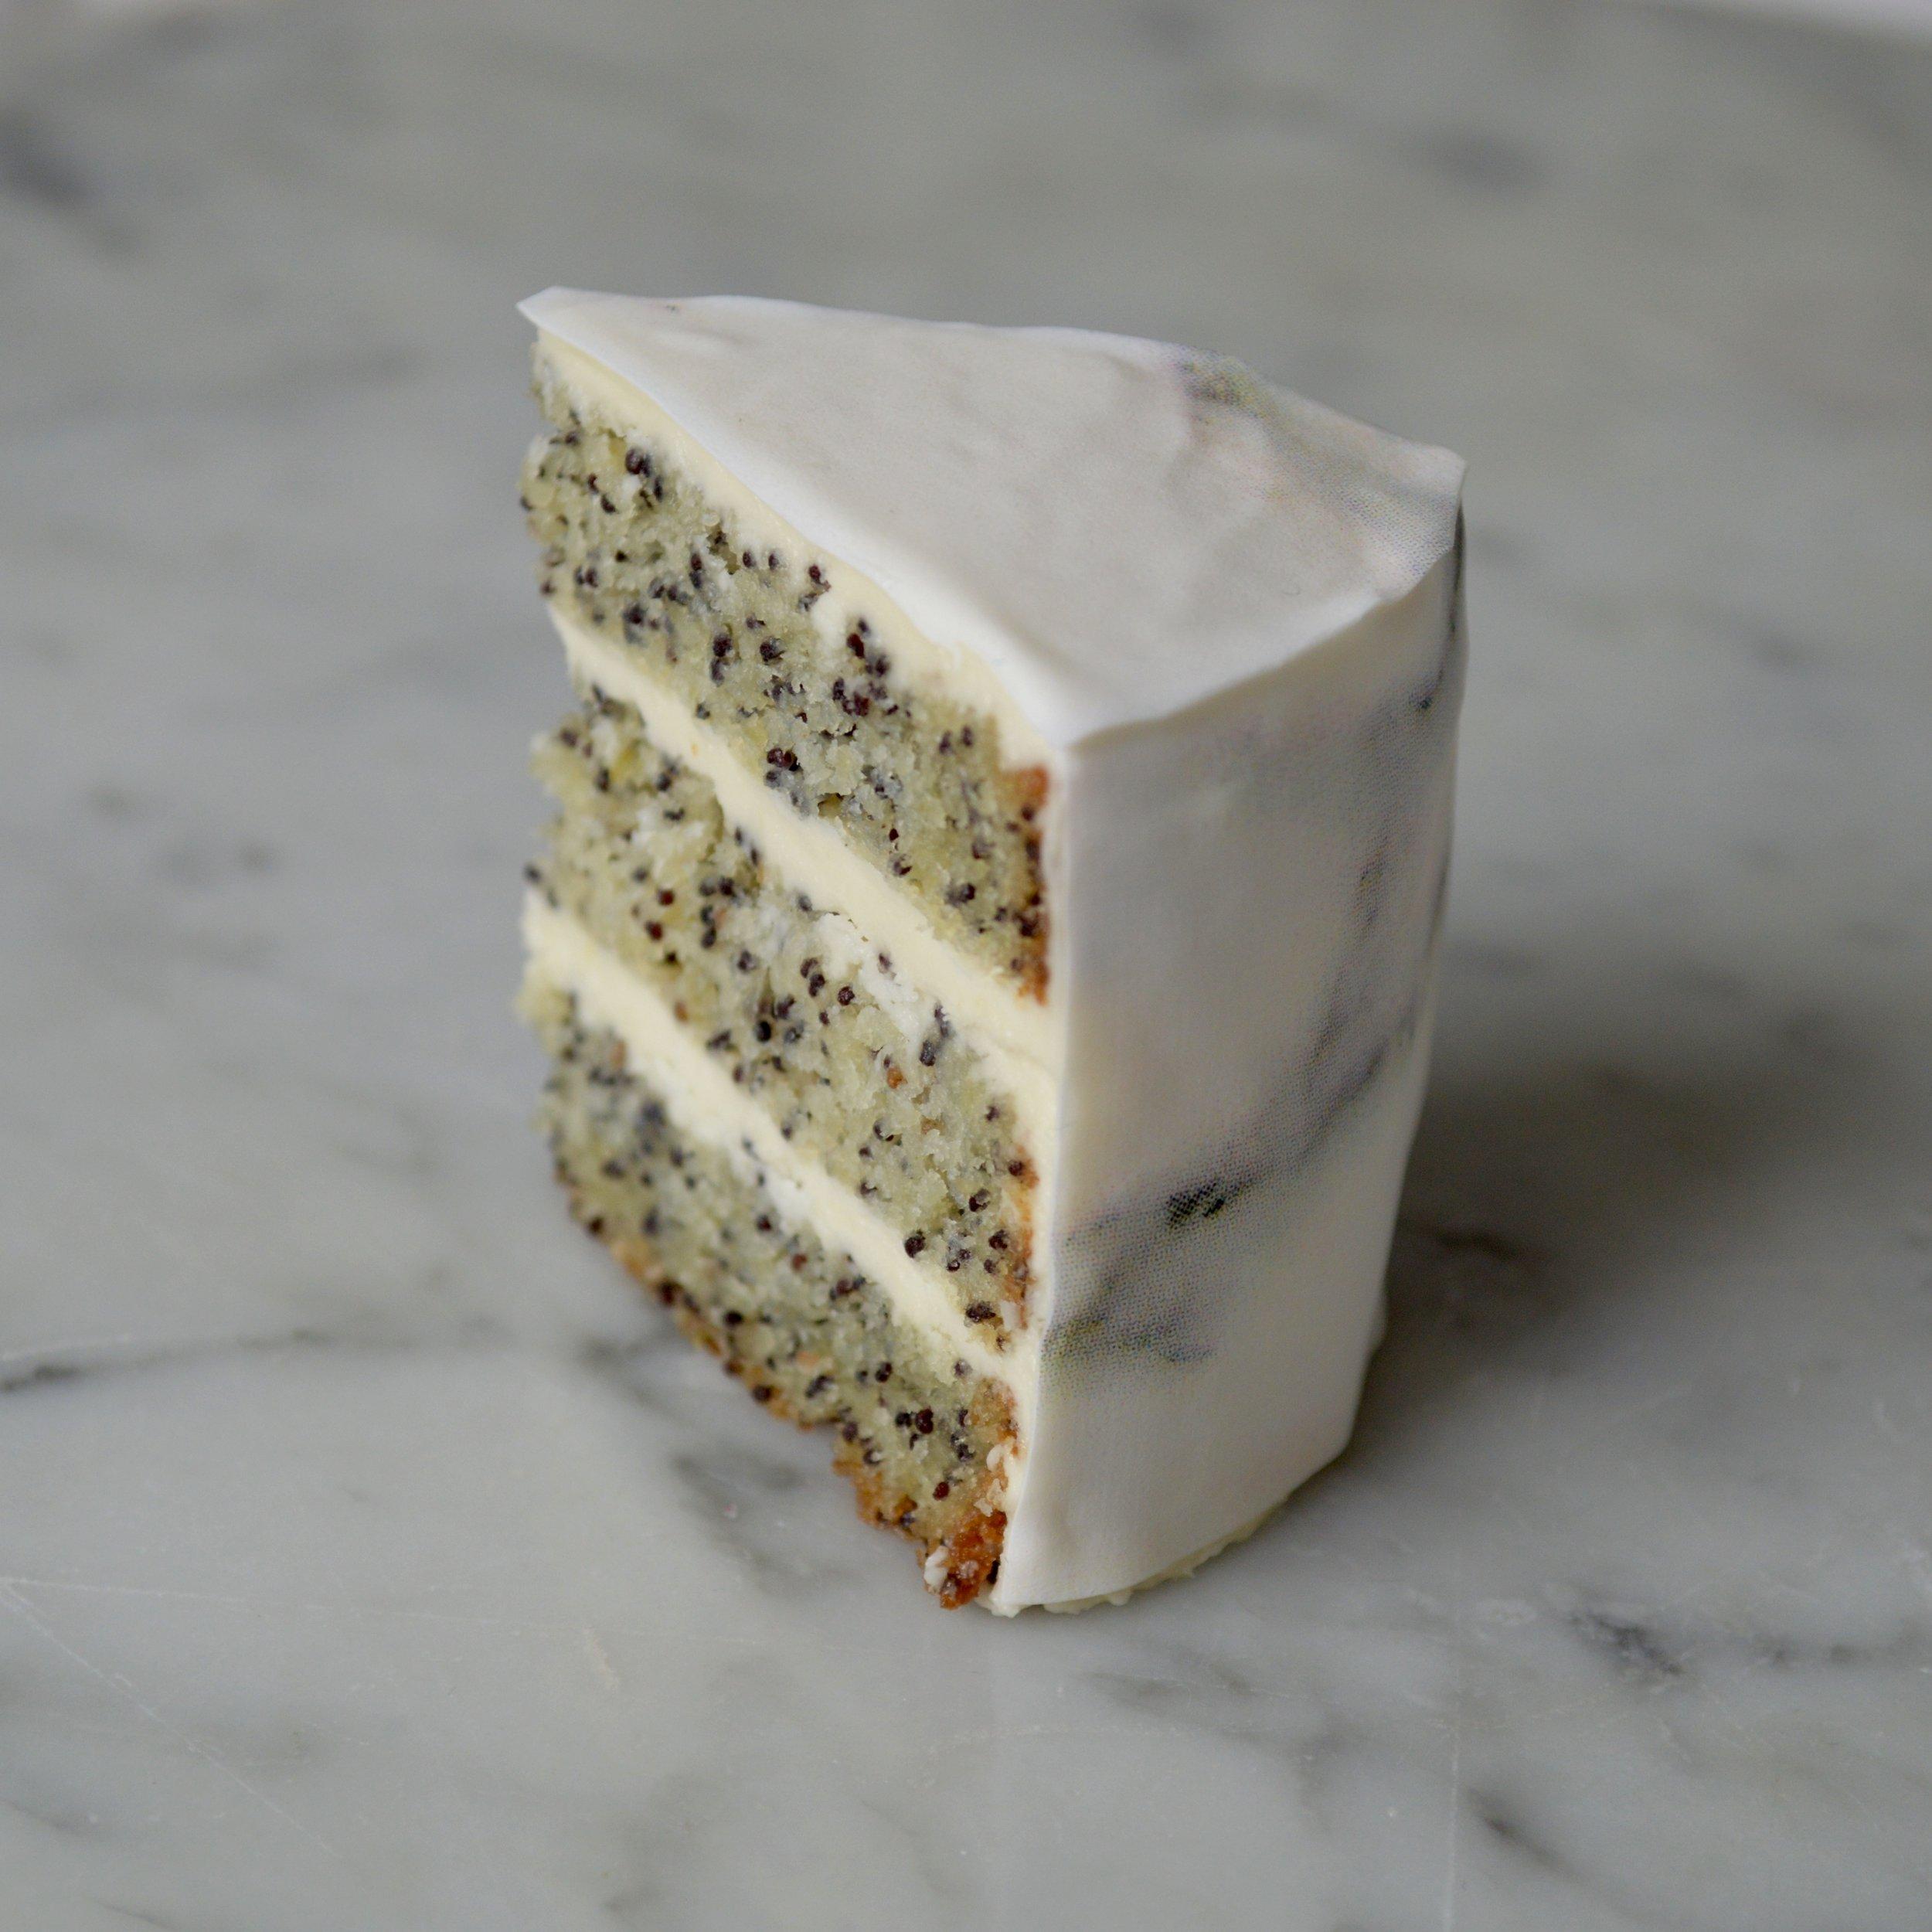 Poppyseed Cake that looks like Marble